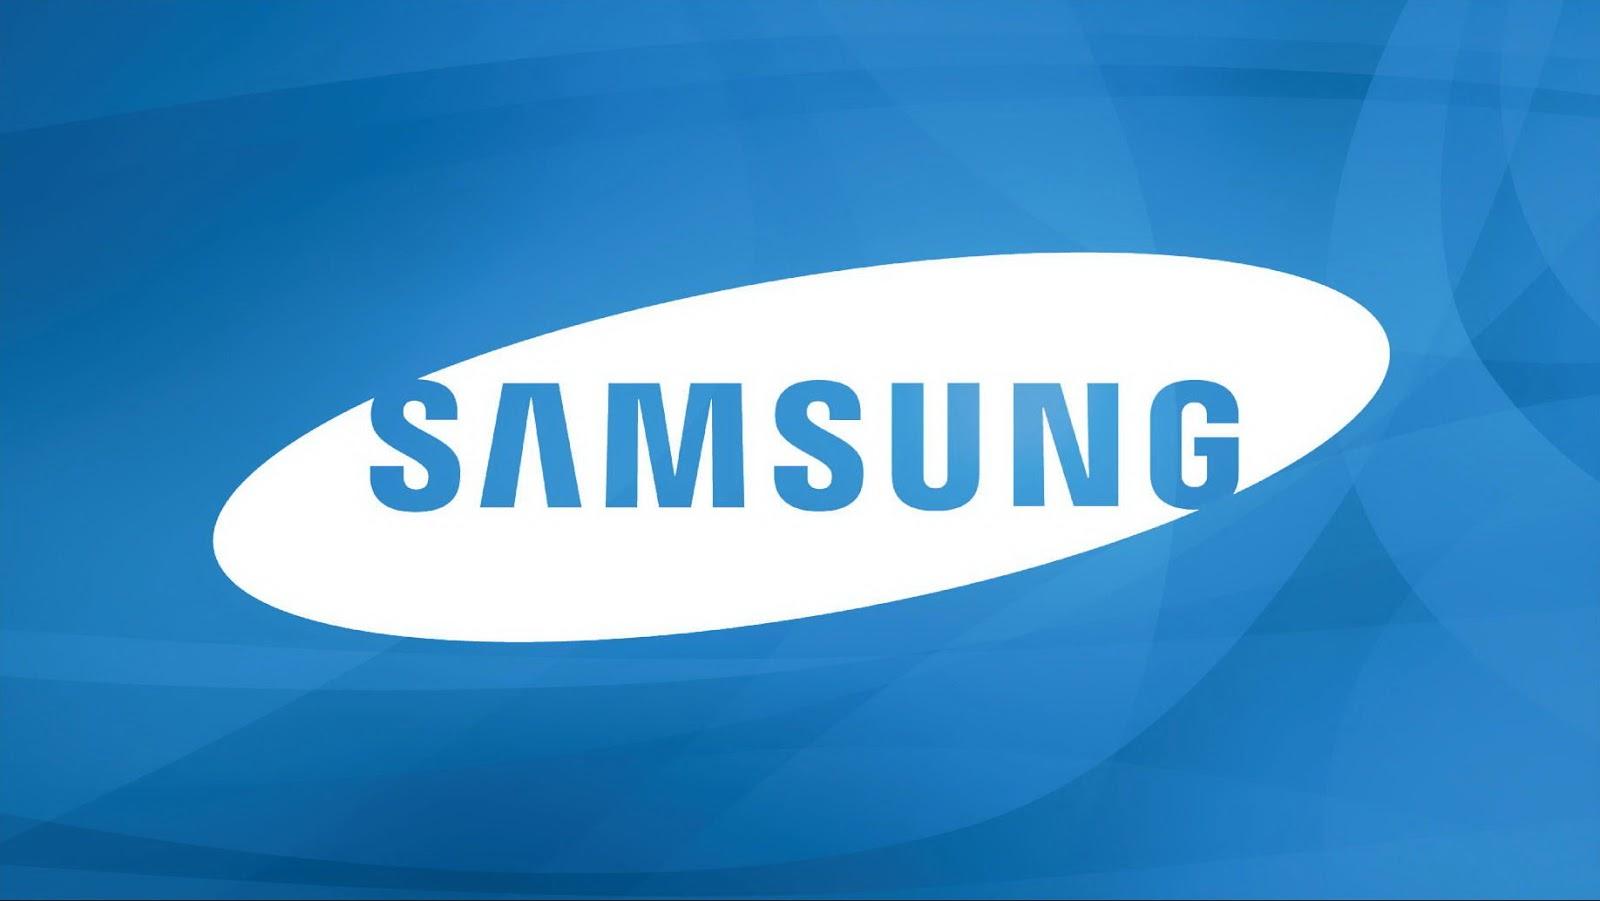 http://4.bp.blogspot.com/-1DfX0mIceME/UPRNMQ0b3kI/AAAAAAAAB-w/Op1g_DDDOEs/s1600/Samsung+Logo+Wallpaper+Blue+Colour.jpg